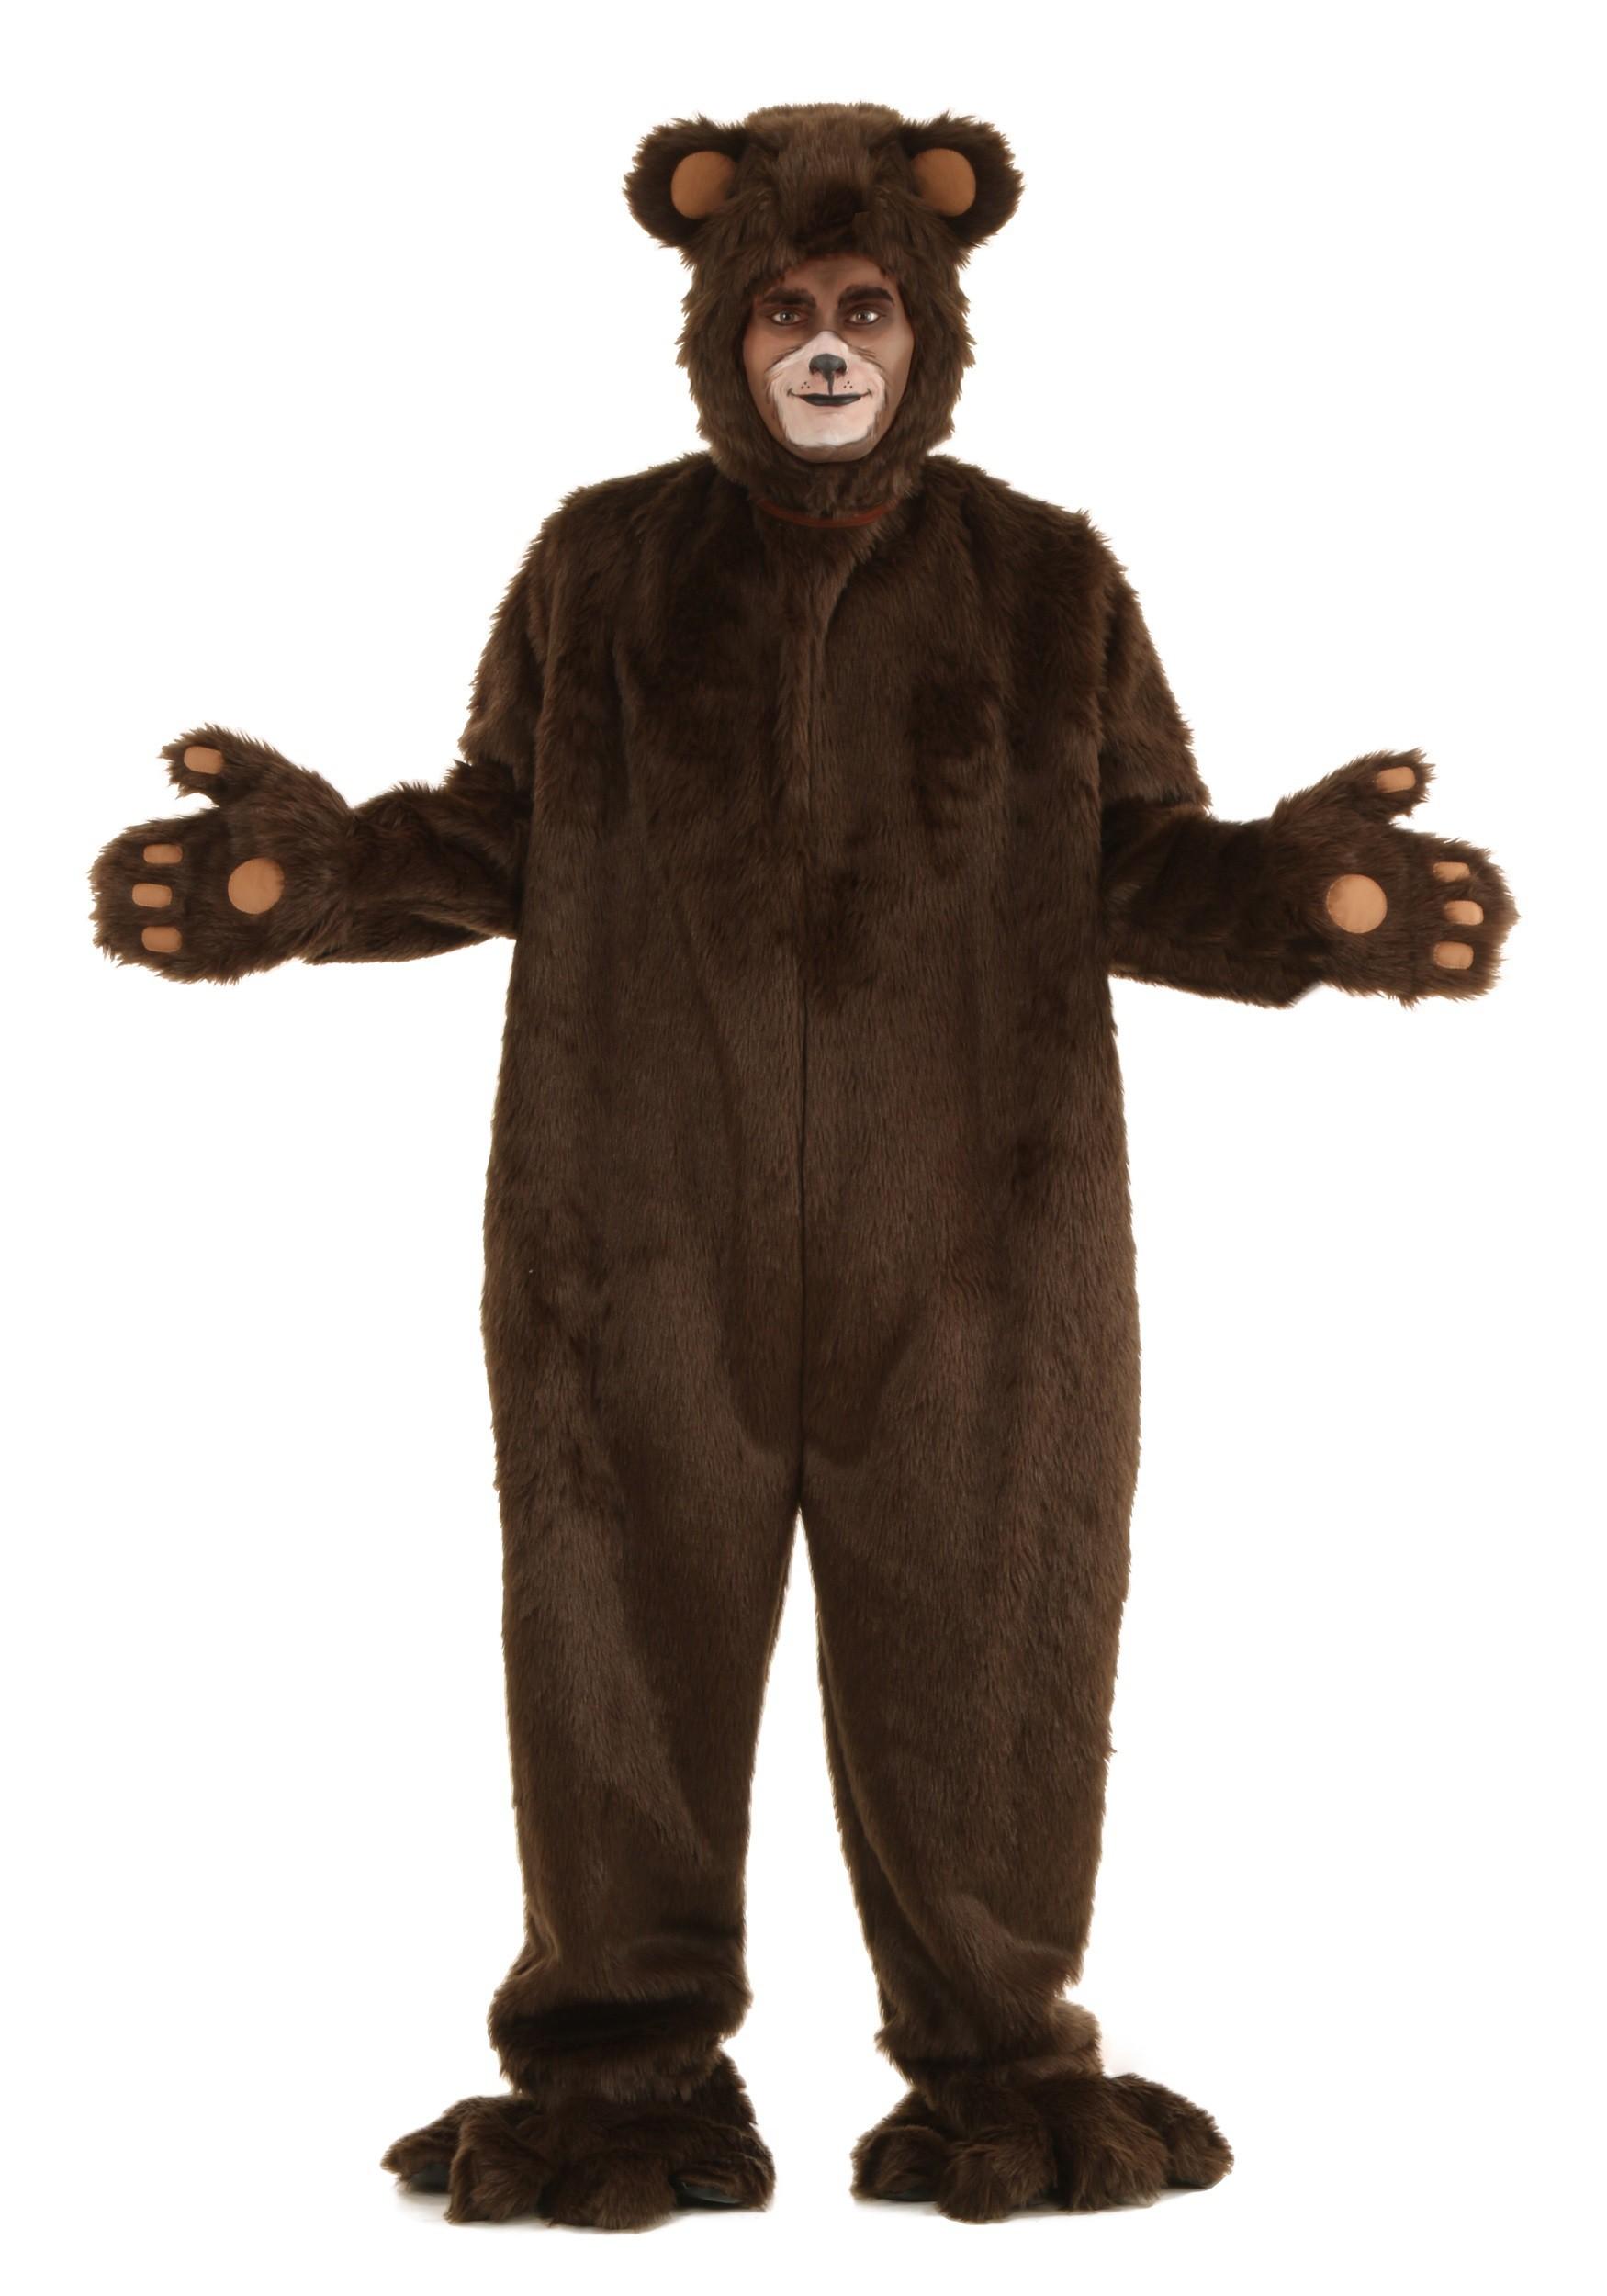 Deluxe Furry Brown Bear Costume for Men